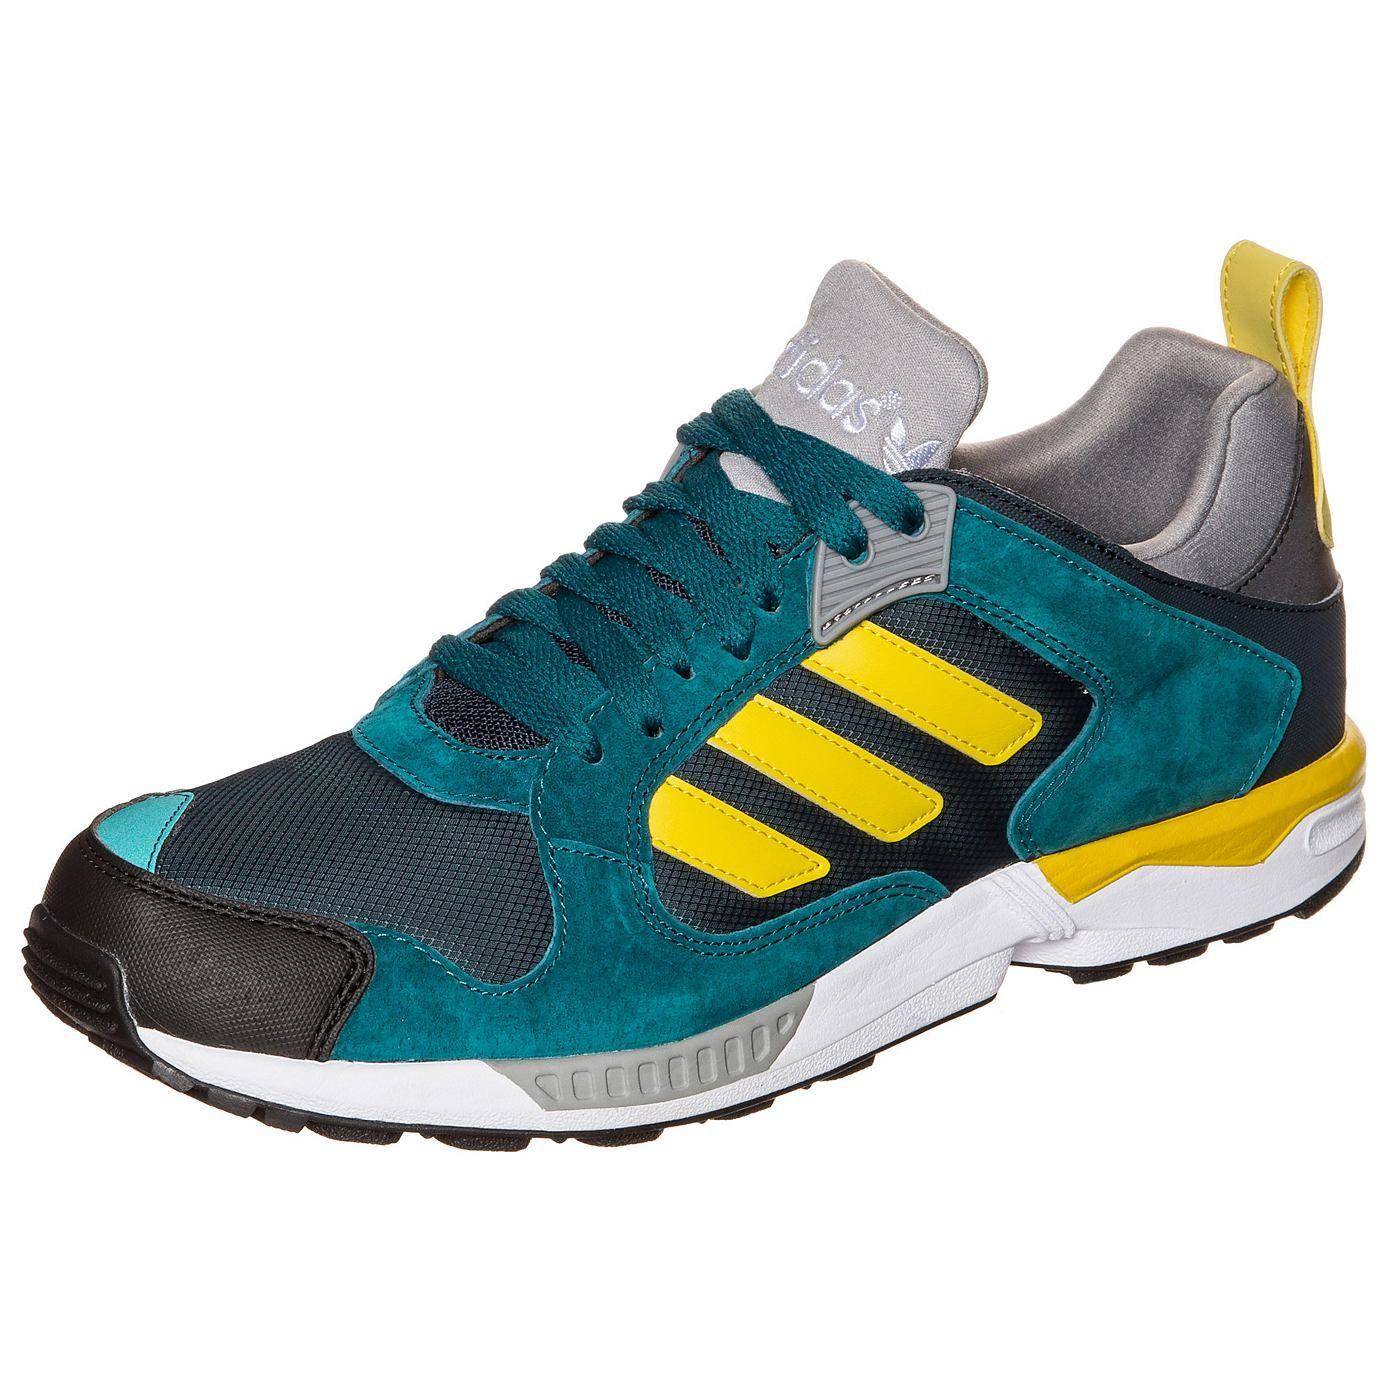 new product 92844 ae46a adidas Originals ZX Flux EL Sneaker Kleinkinder | jogging